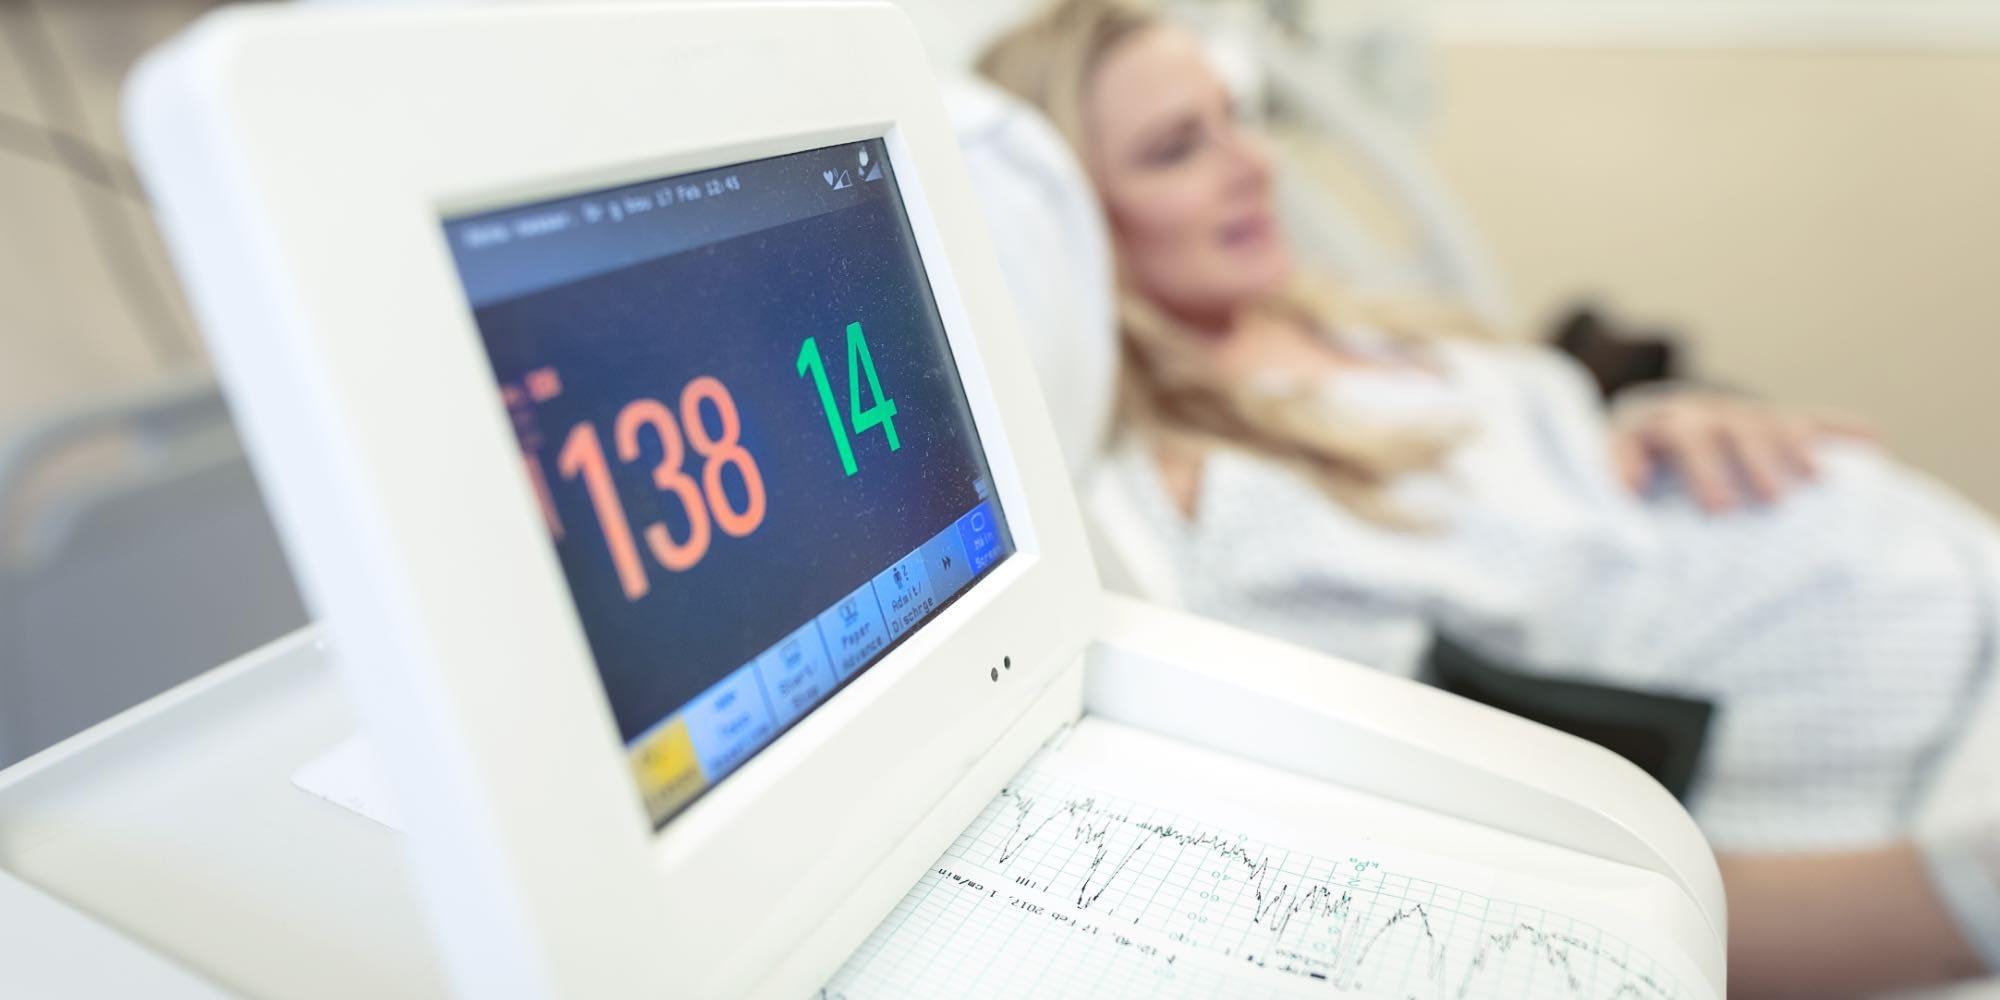 Birthing options Sydney Obstetrician Dr Anu Mahadik